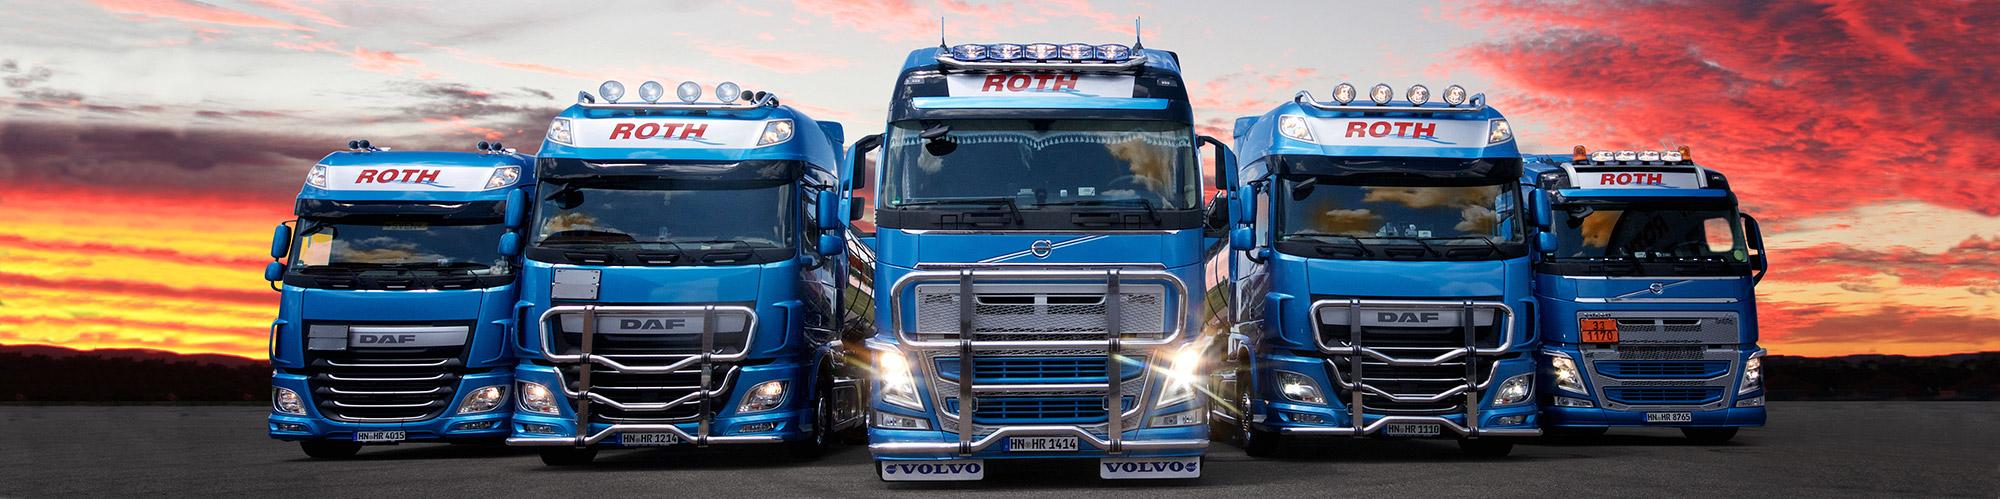 Roth Tanktransporter Frontal Leistungen